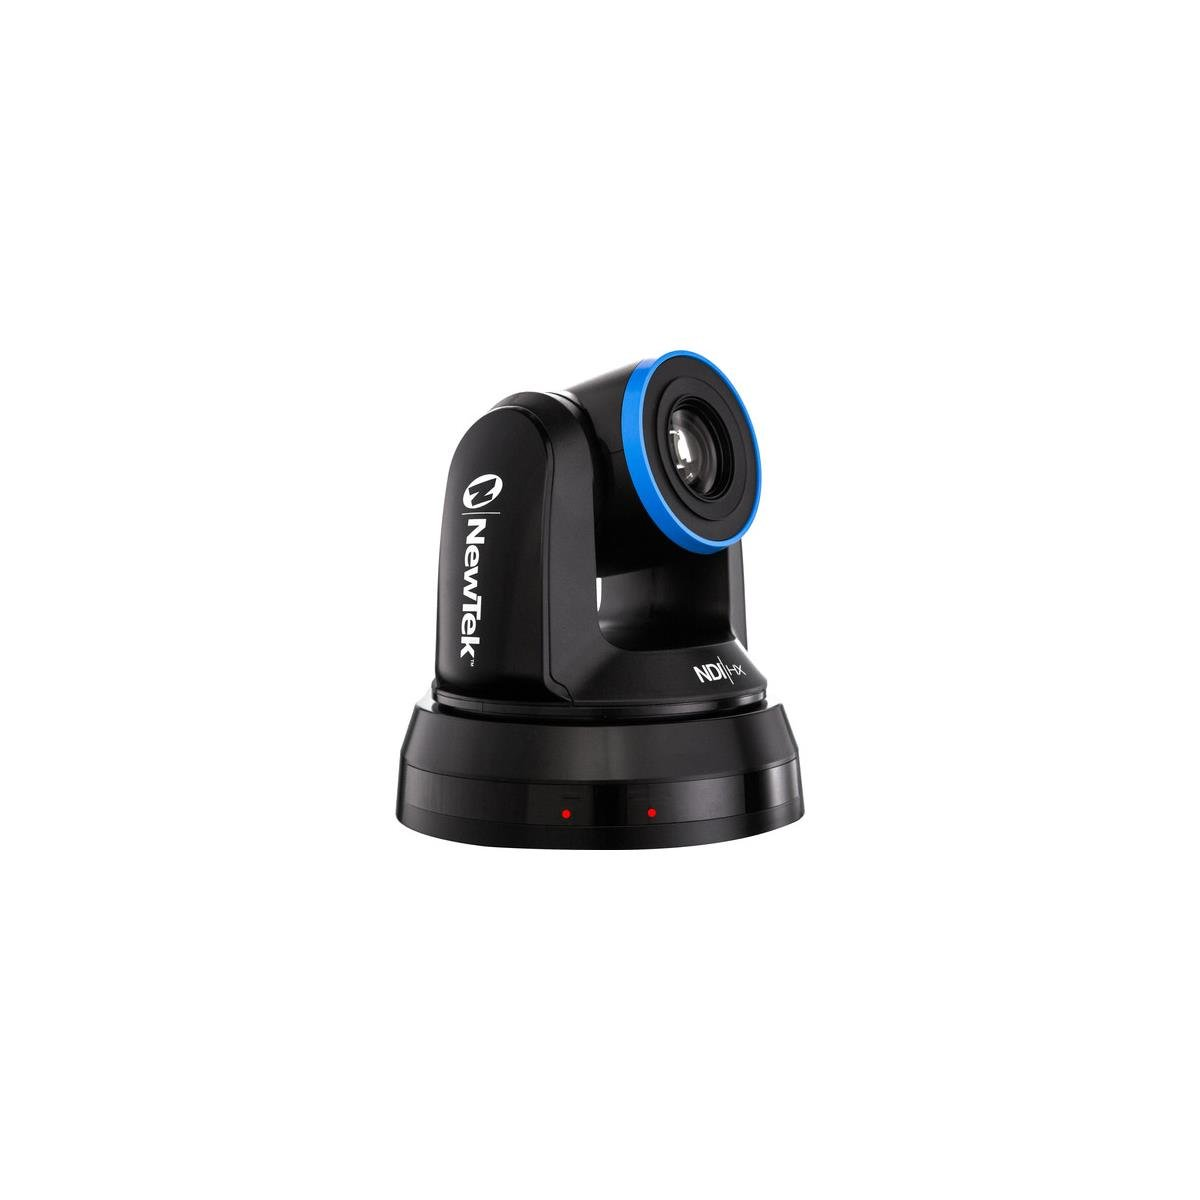 NewTek NDIHX-PTZ1 NDI PTZ Camera - With NewTek Connect Spark HDMI, Cleaning Kit by NewTek (Image #5)